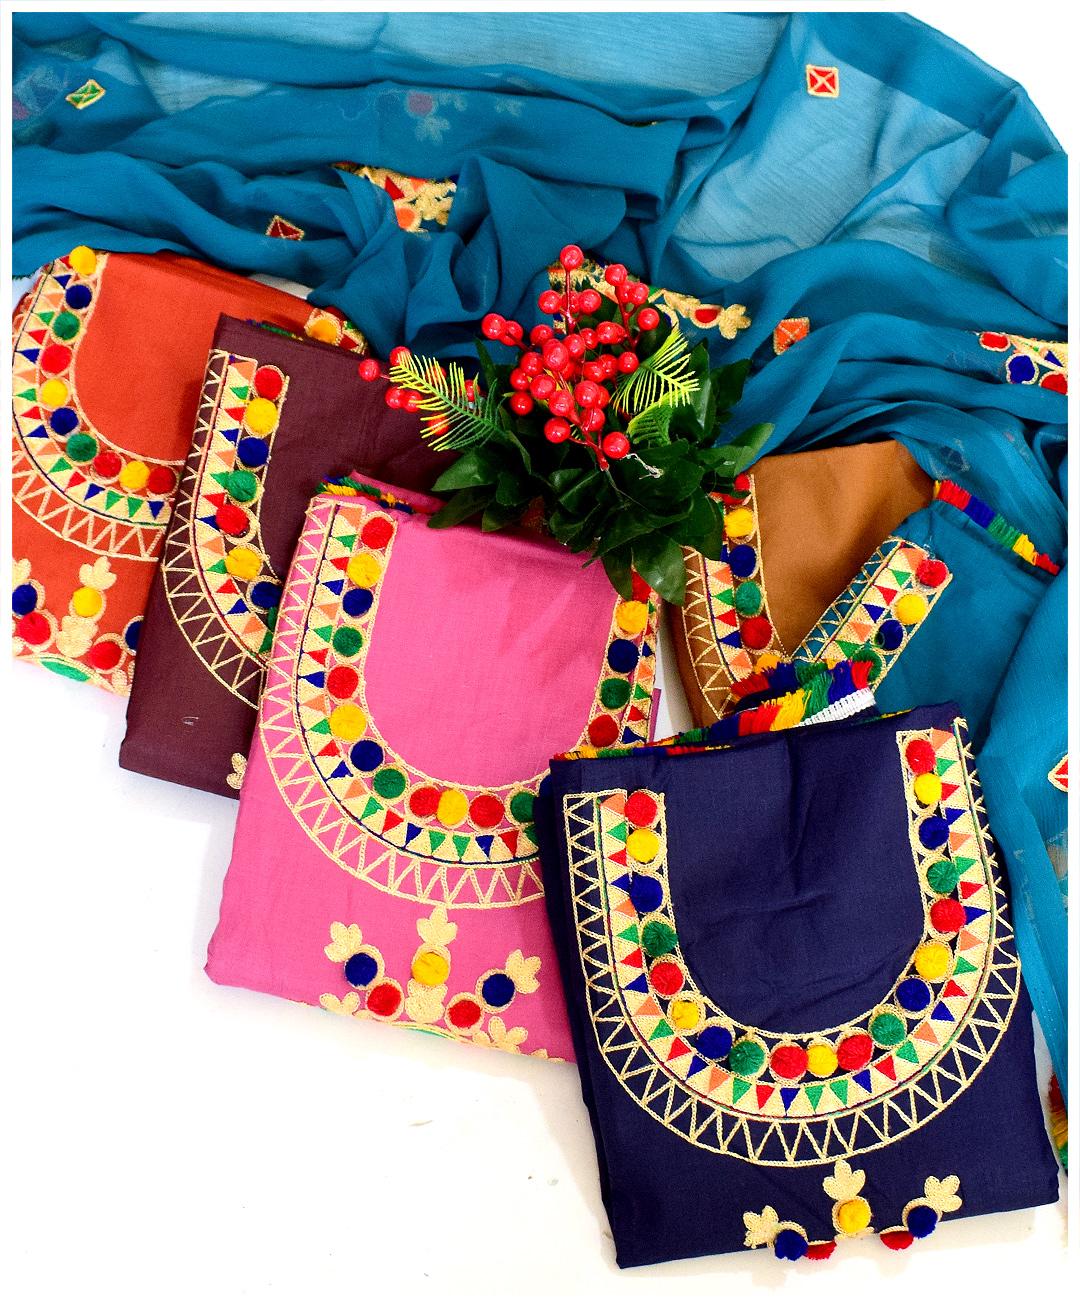 3 PCs Un-Stitched Lawn Machine Embroidered Aari Ball Suits With Chiffon Dupatta - QA285E